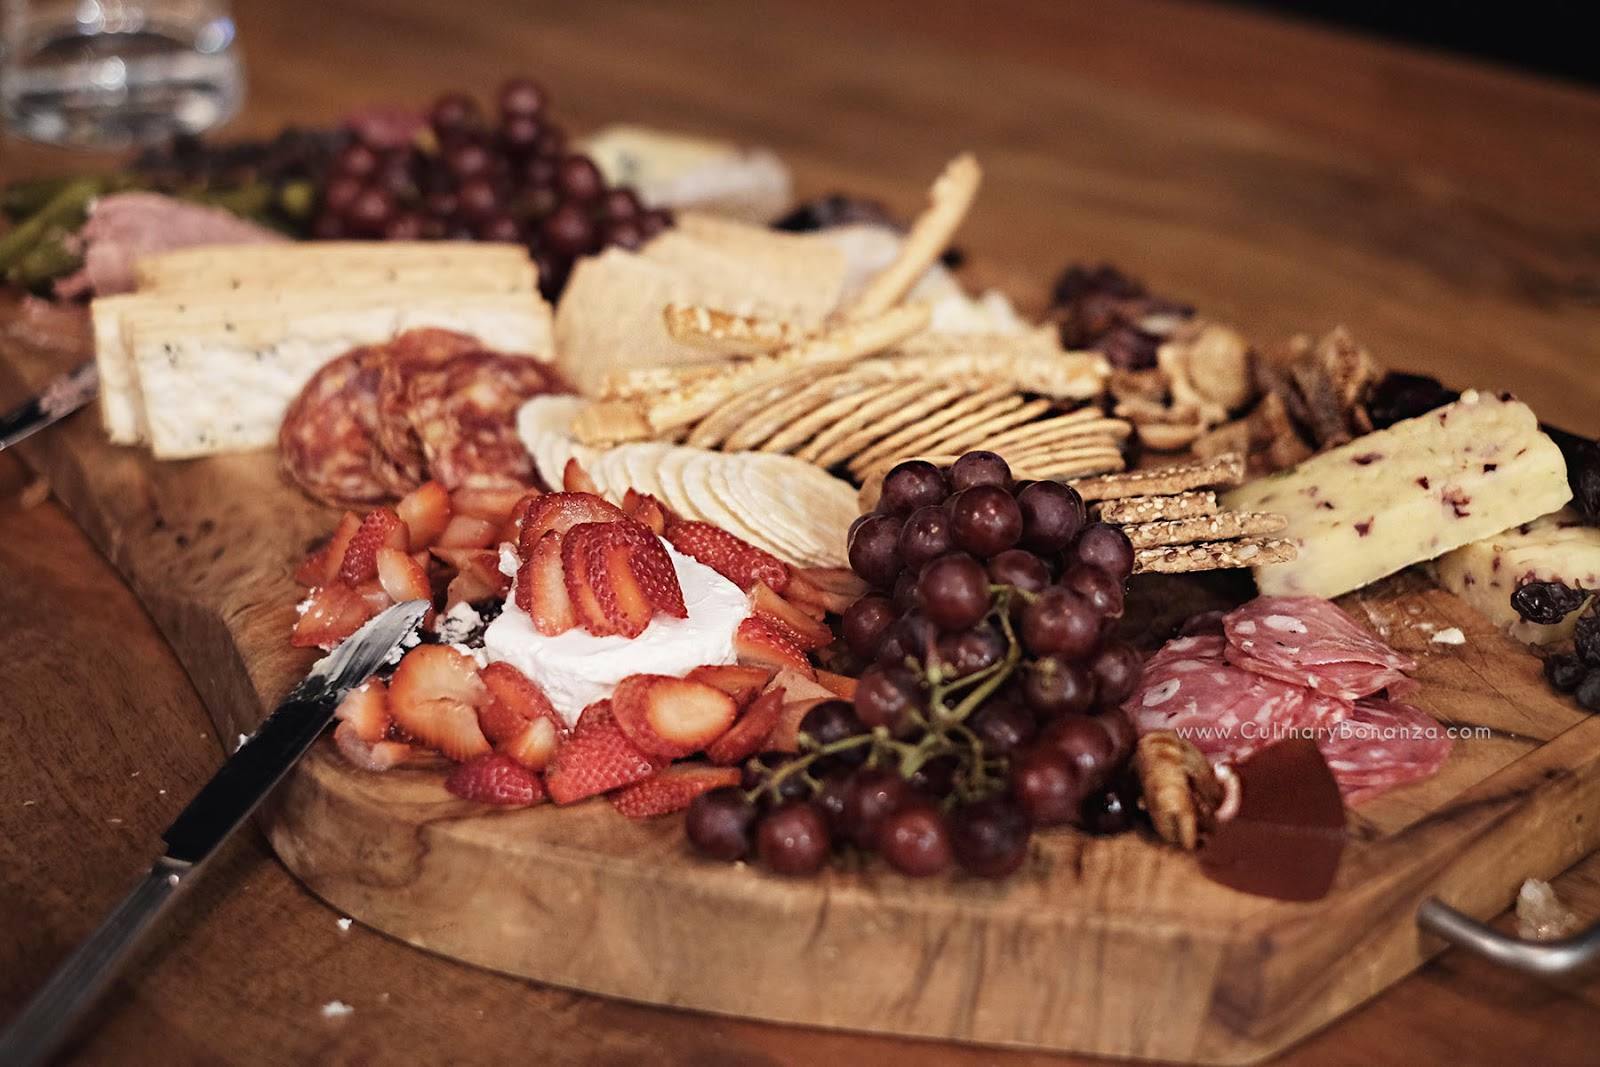 Twenty Five Doors online platform that's changing the wine experience (www.culinarybonanza.com)